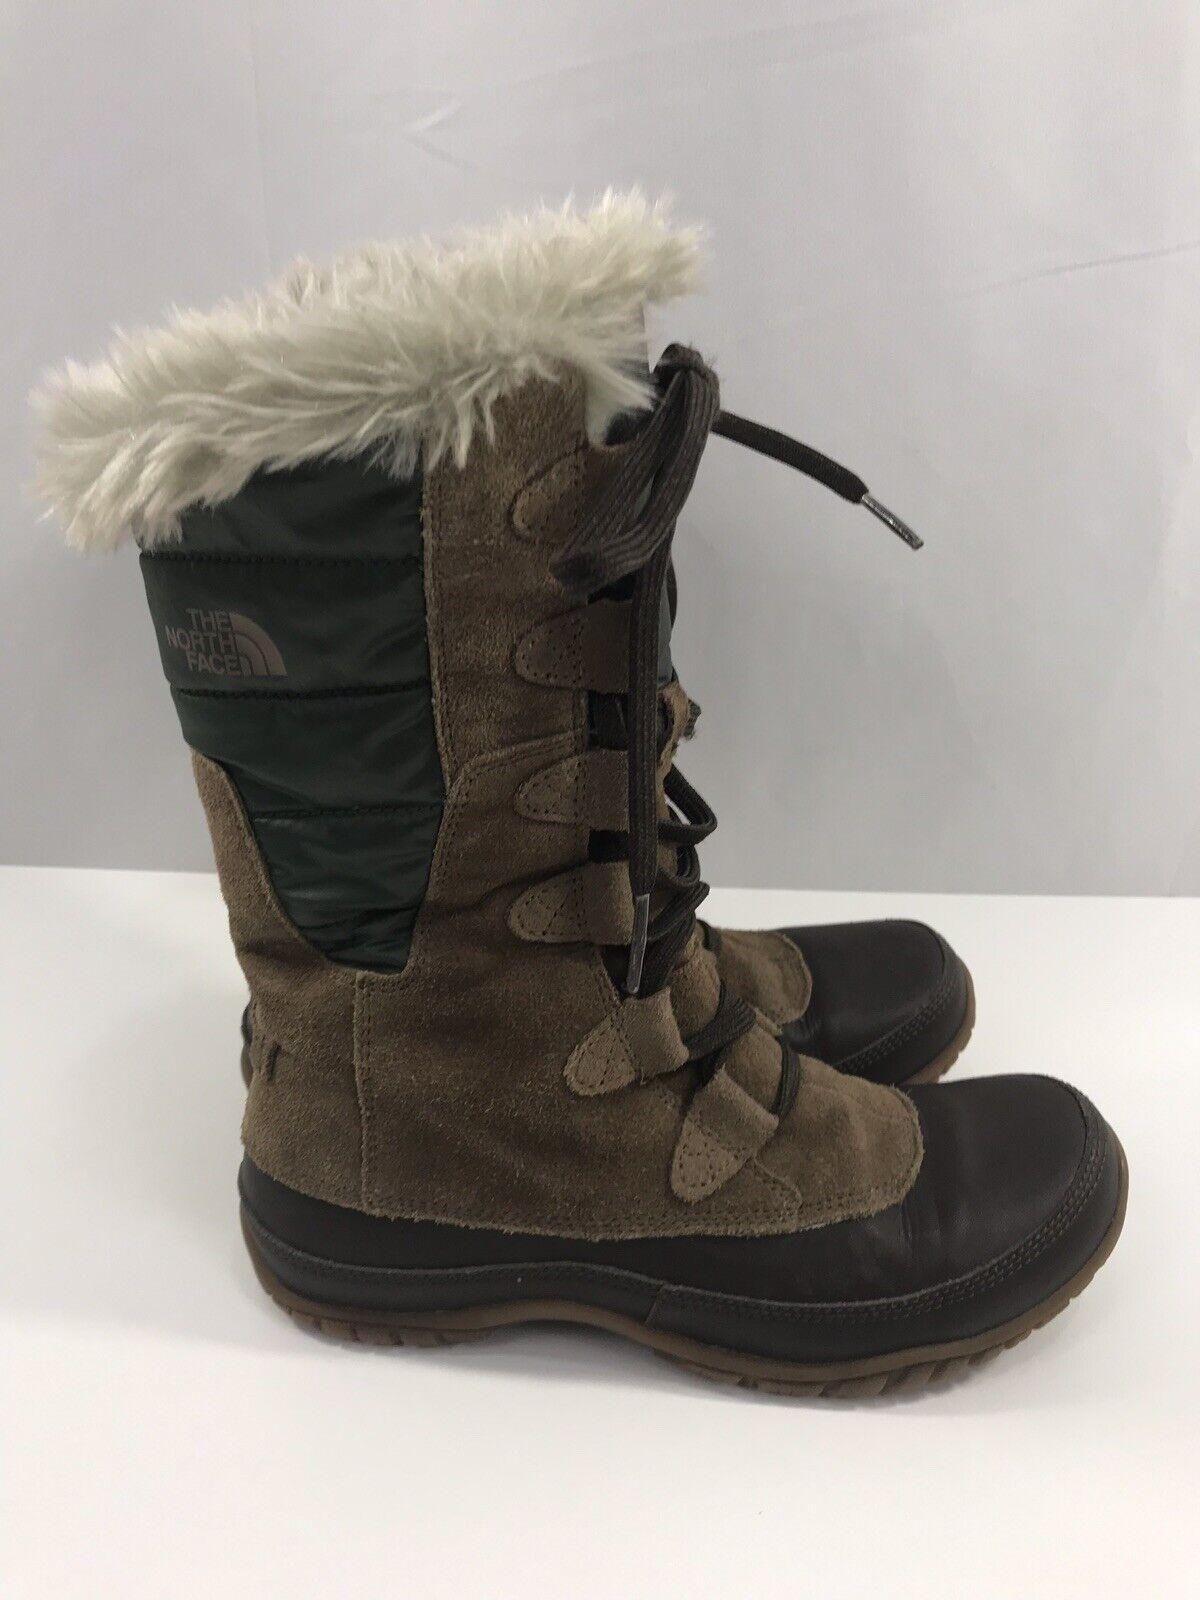 The North Face Winter Boots Nuptse Purna 200 gram Primaloft Women's SZ 6